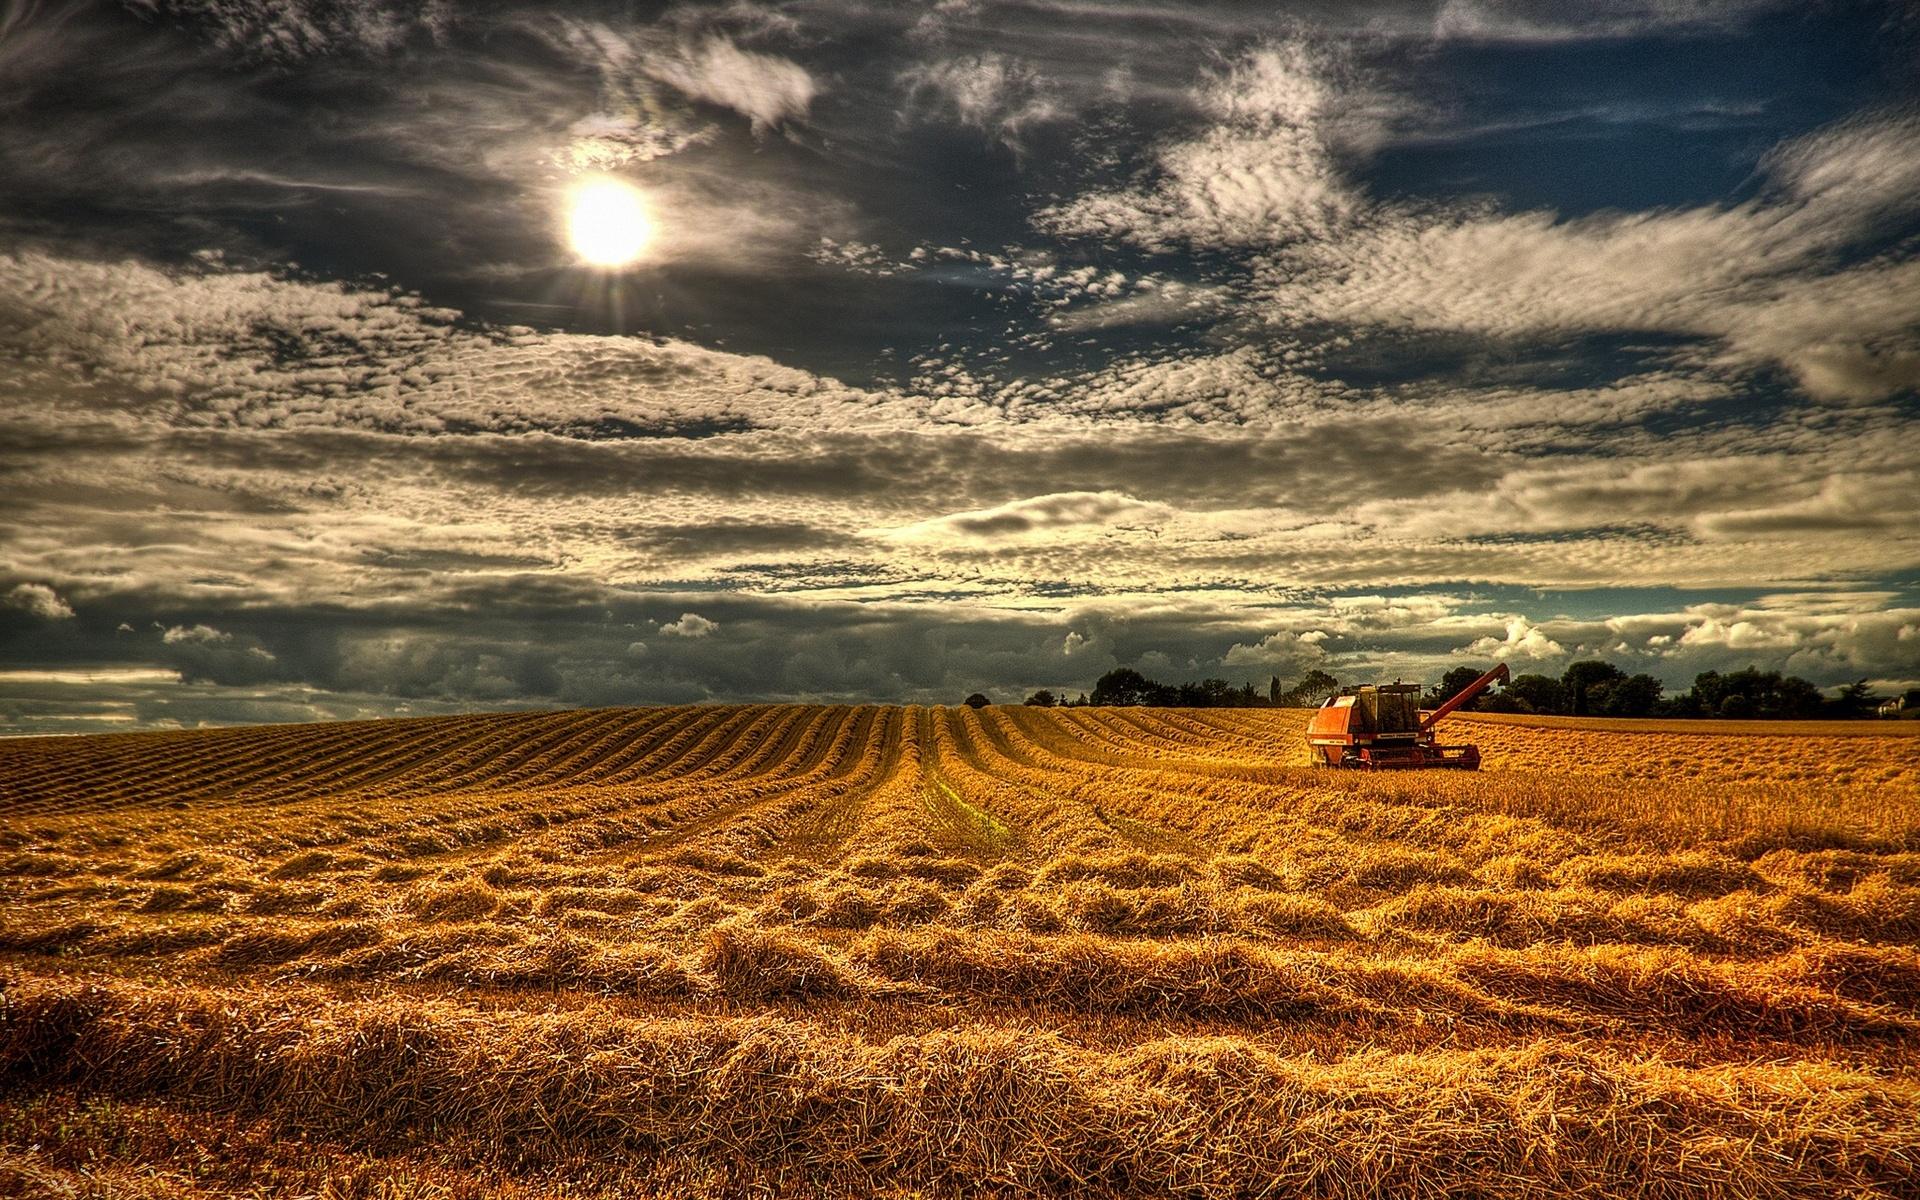 download Northern Ireland England field grain harvest 1920x1200